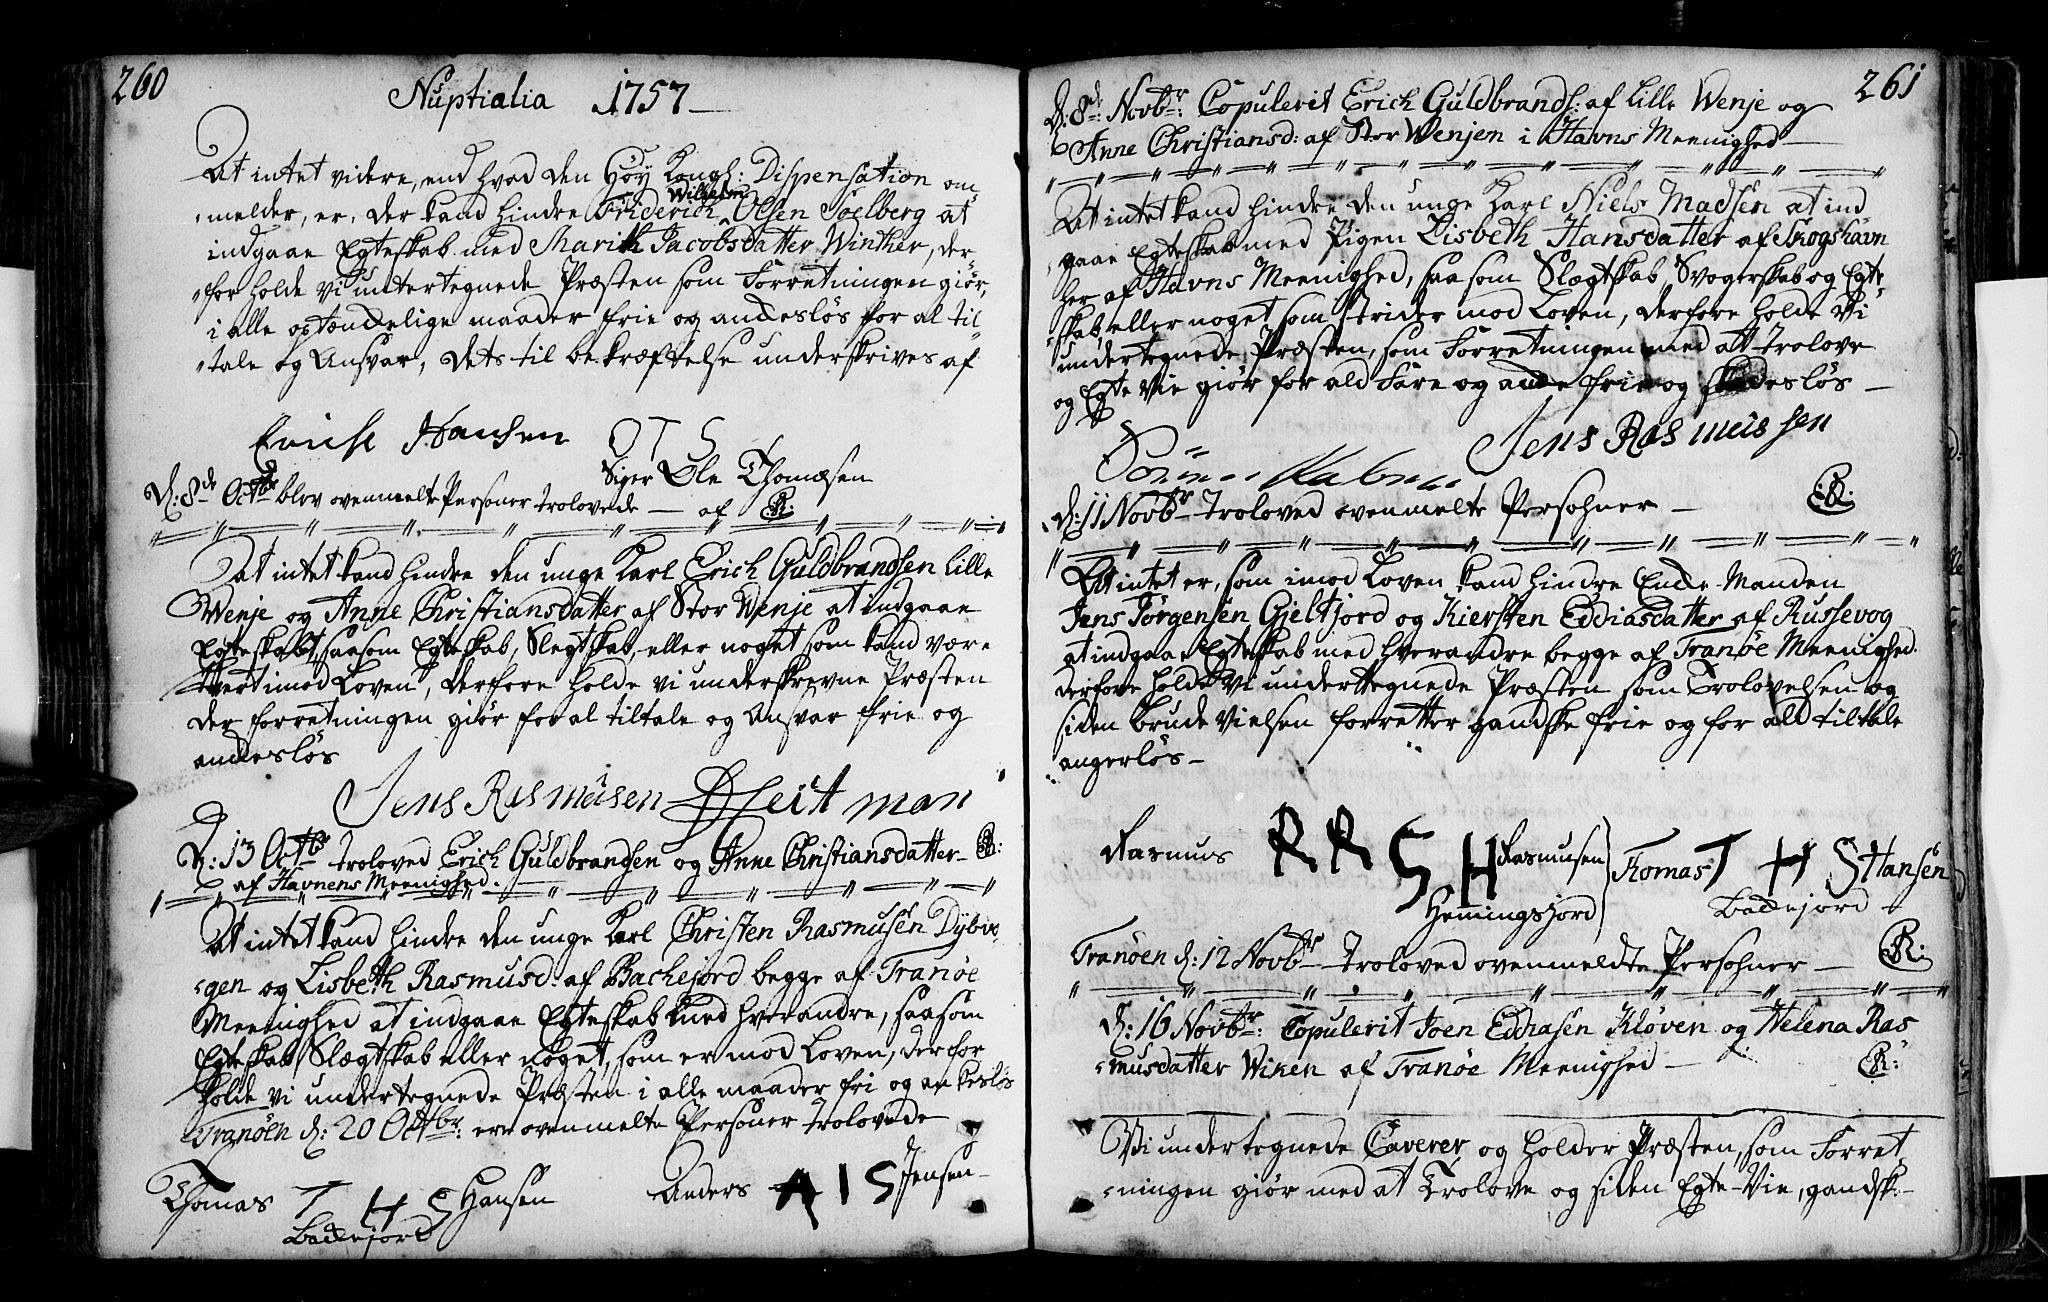 SATØ, Tranøy sokneprestkontor, I/Ia/Iaa/L0001kirke: Ministerialbok nr. 1, 1757-1773, s. 260-261